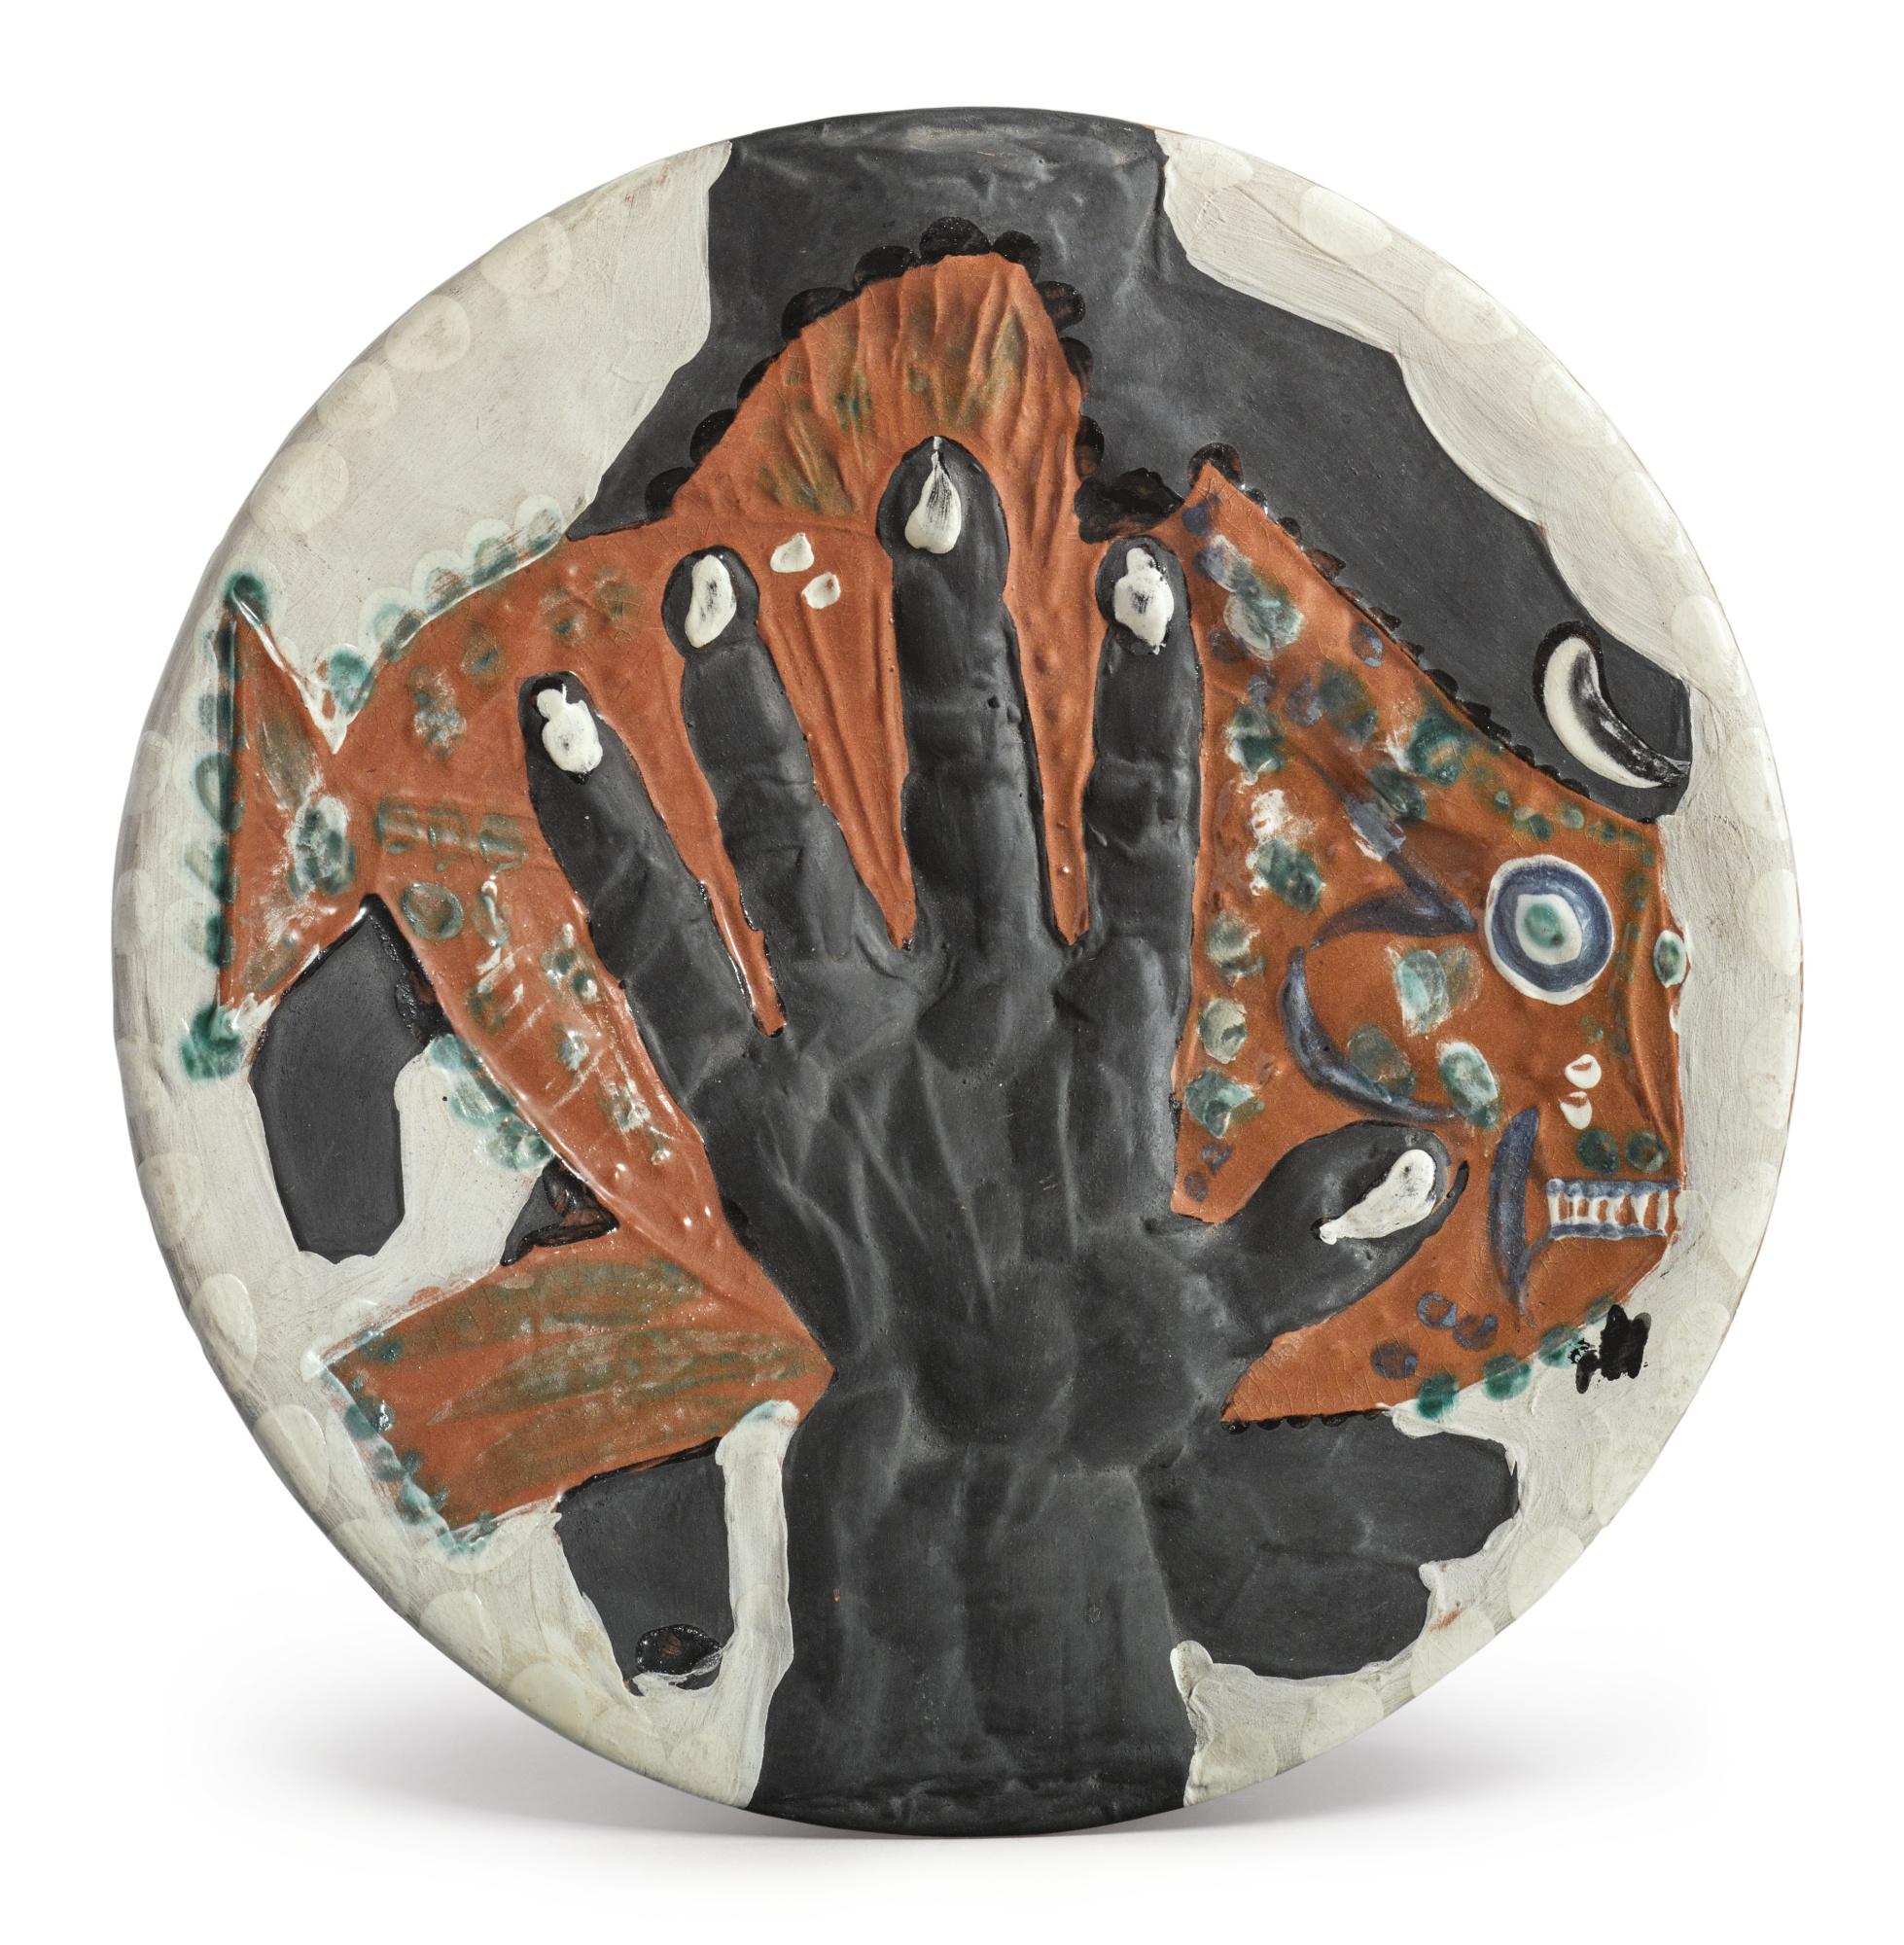 Pablo Picasso-Mains Au Poisson (A.R. 215)-1953